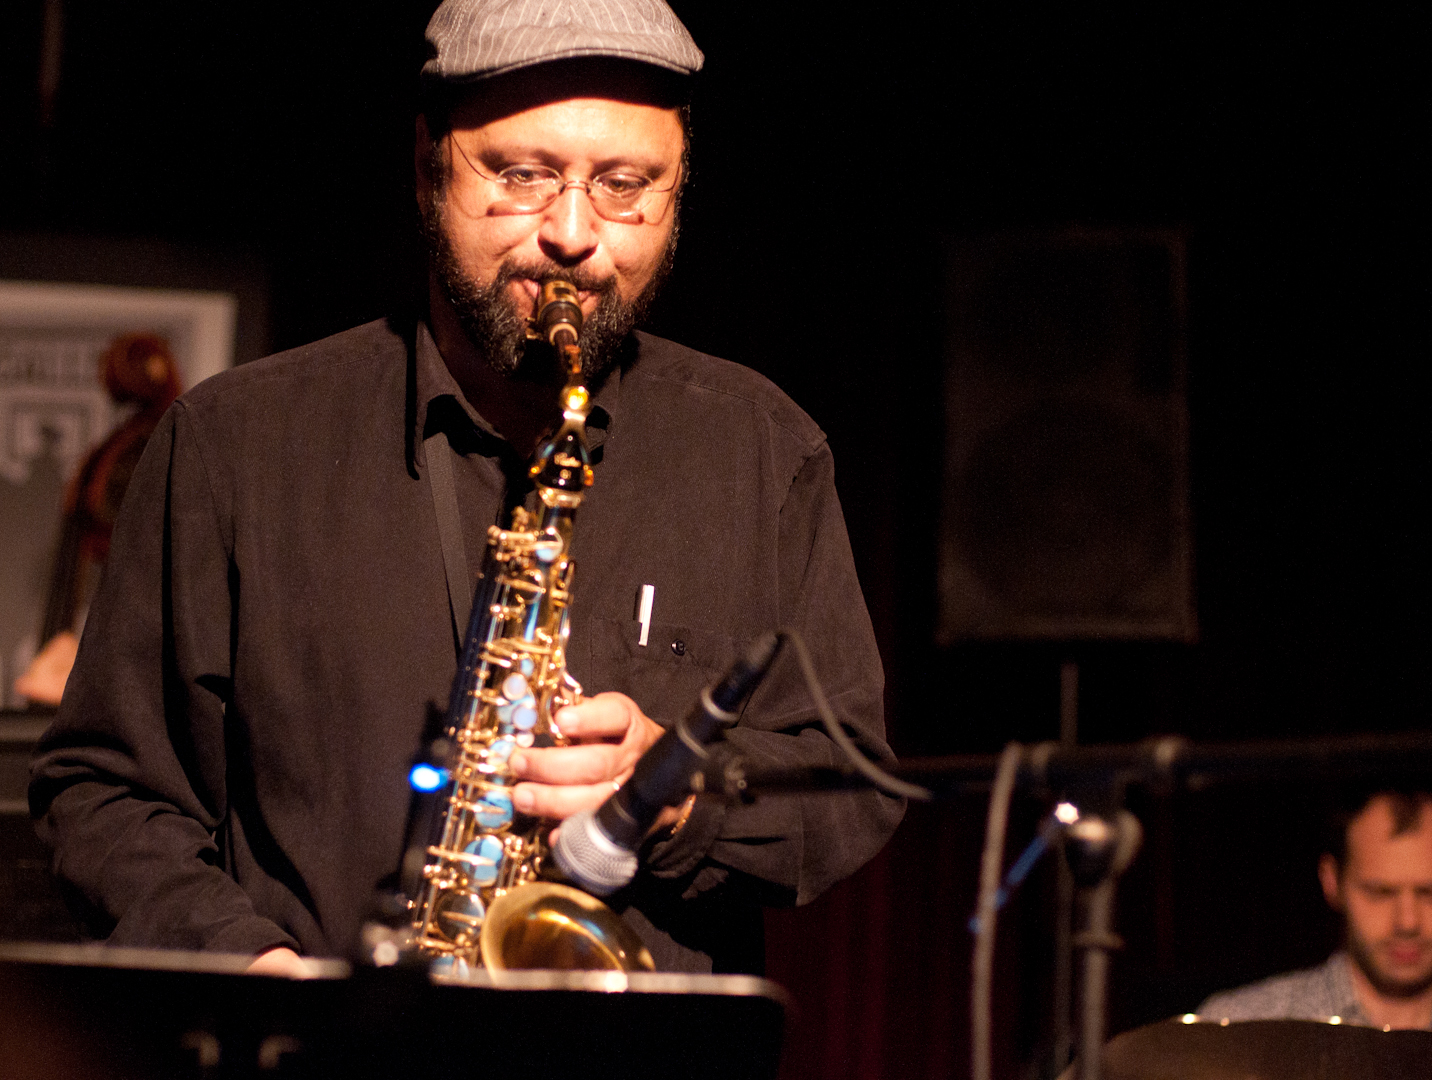 Hafez Modirzadeh with the Elsaffar/Modirzadeh Quintet